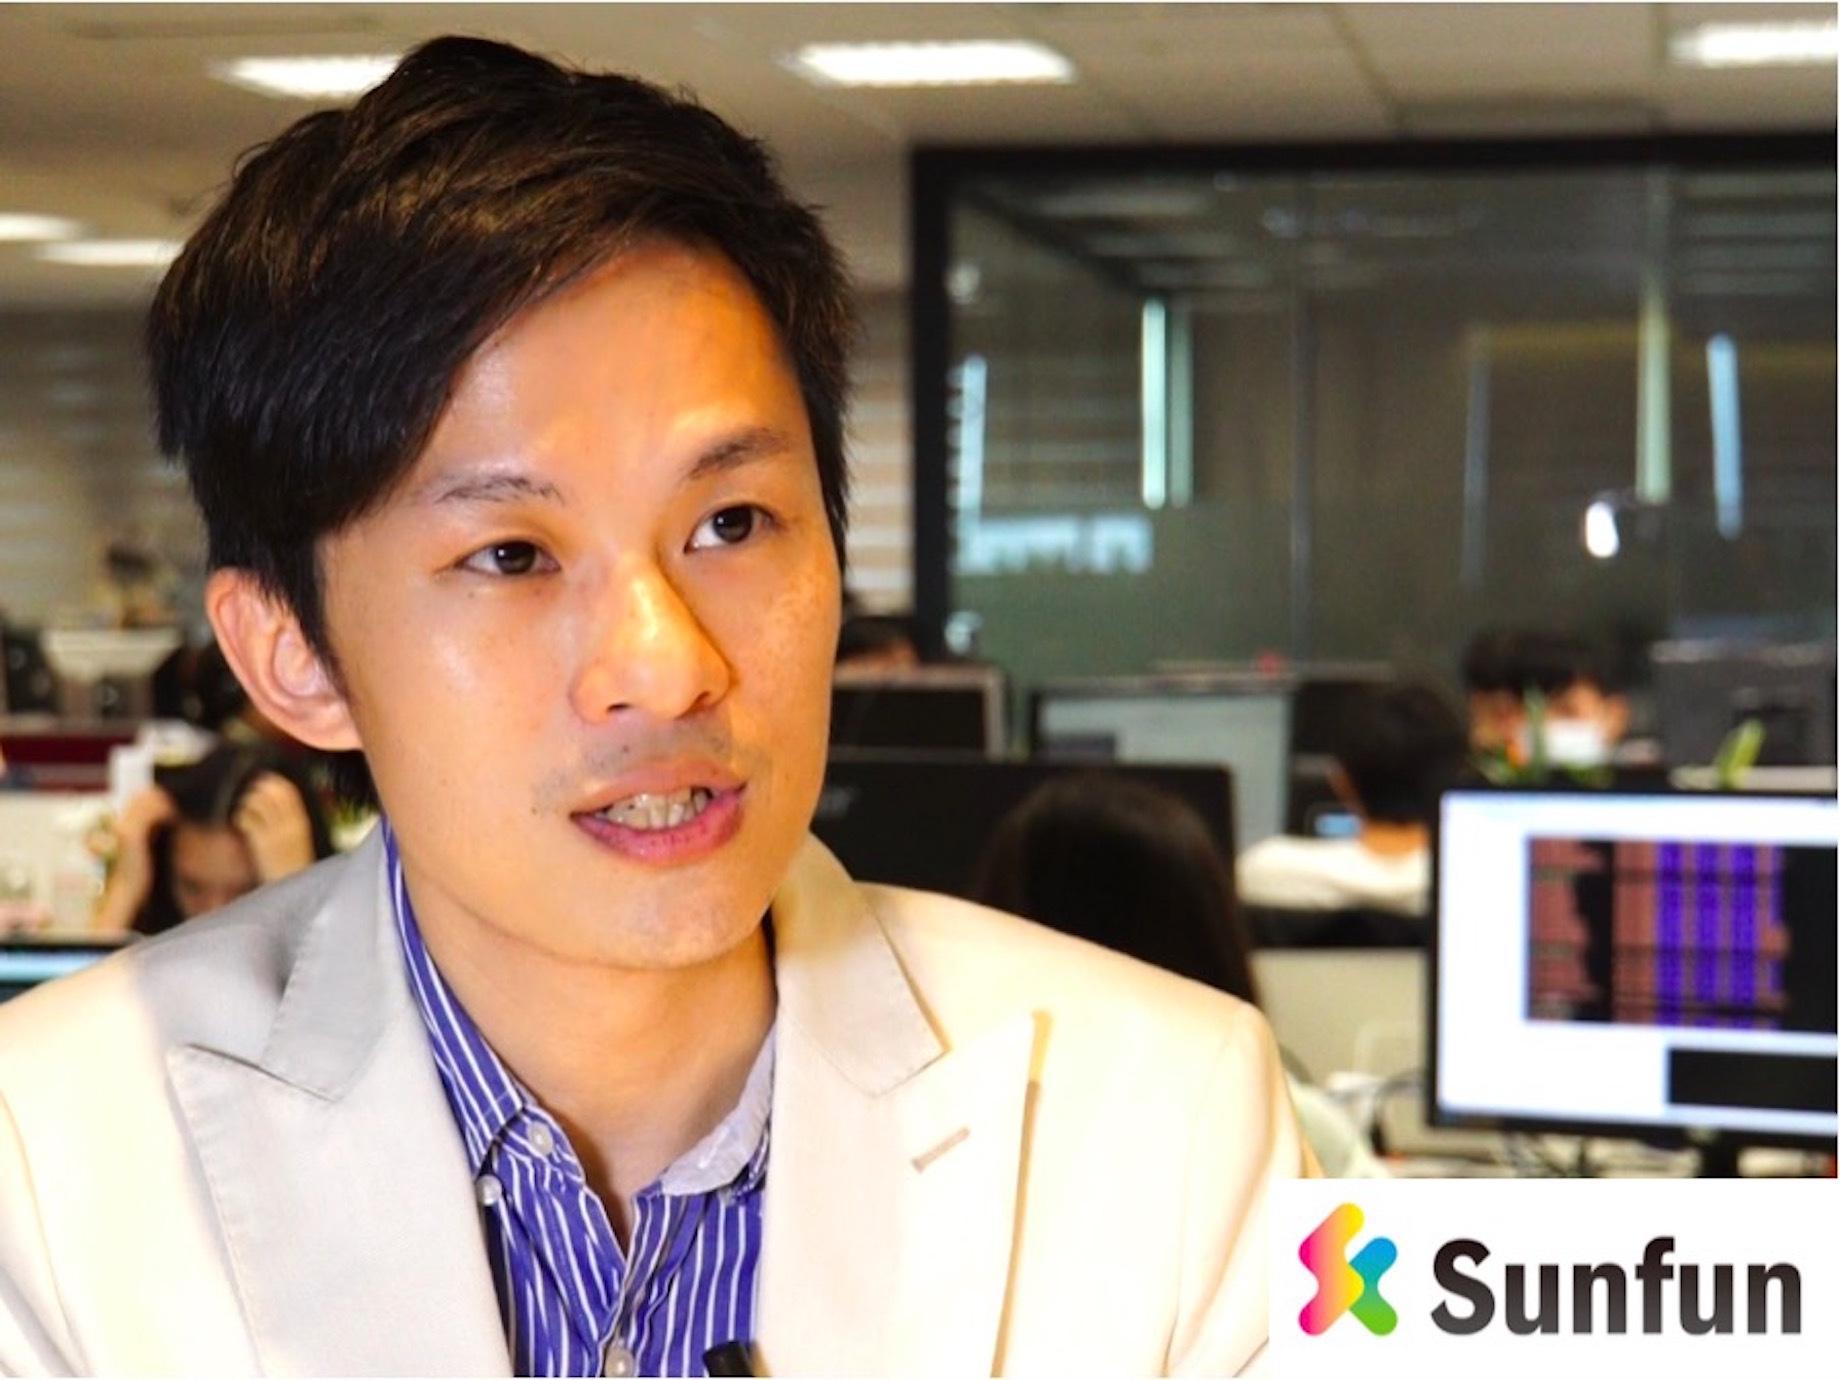 SmartM網路人才學》尚凡資訊(愛情公寓)熱門職缺:軟體工程師、產品企劃、人資專員